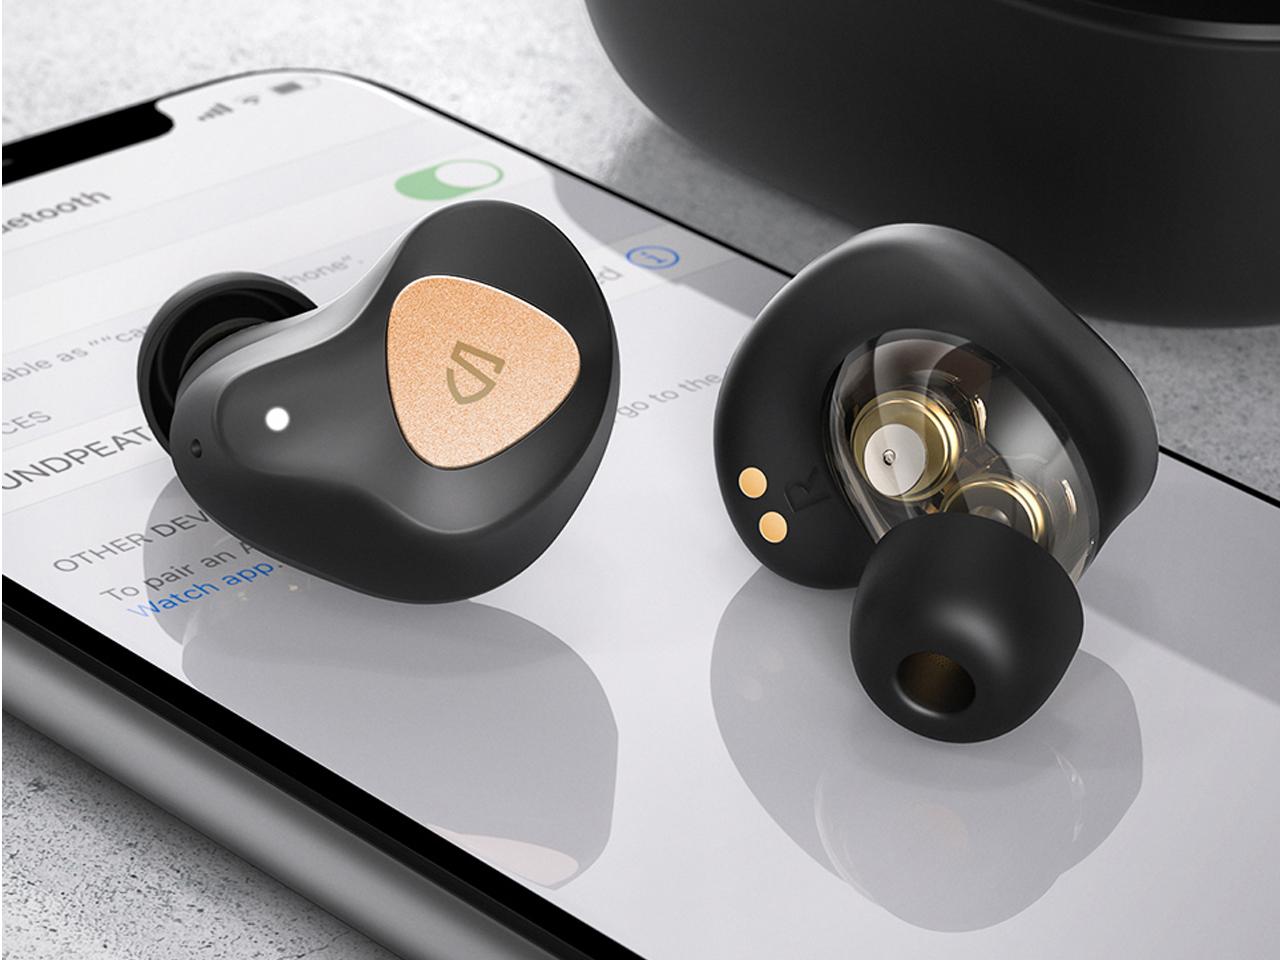 Tai nghe Soundpeats Truengine 3SE kết nối dễ dàng